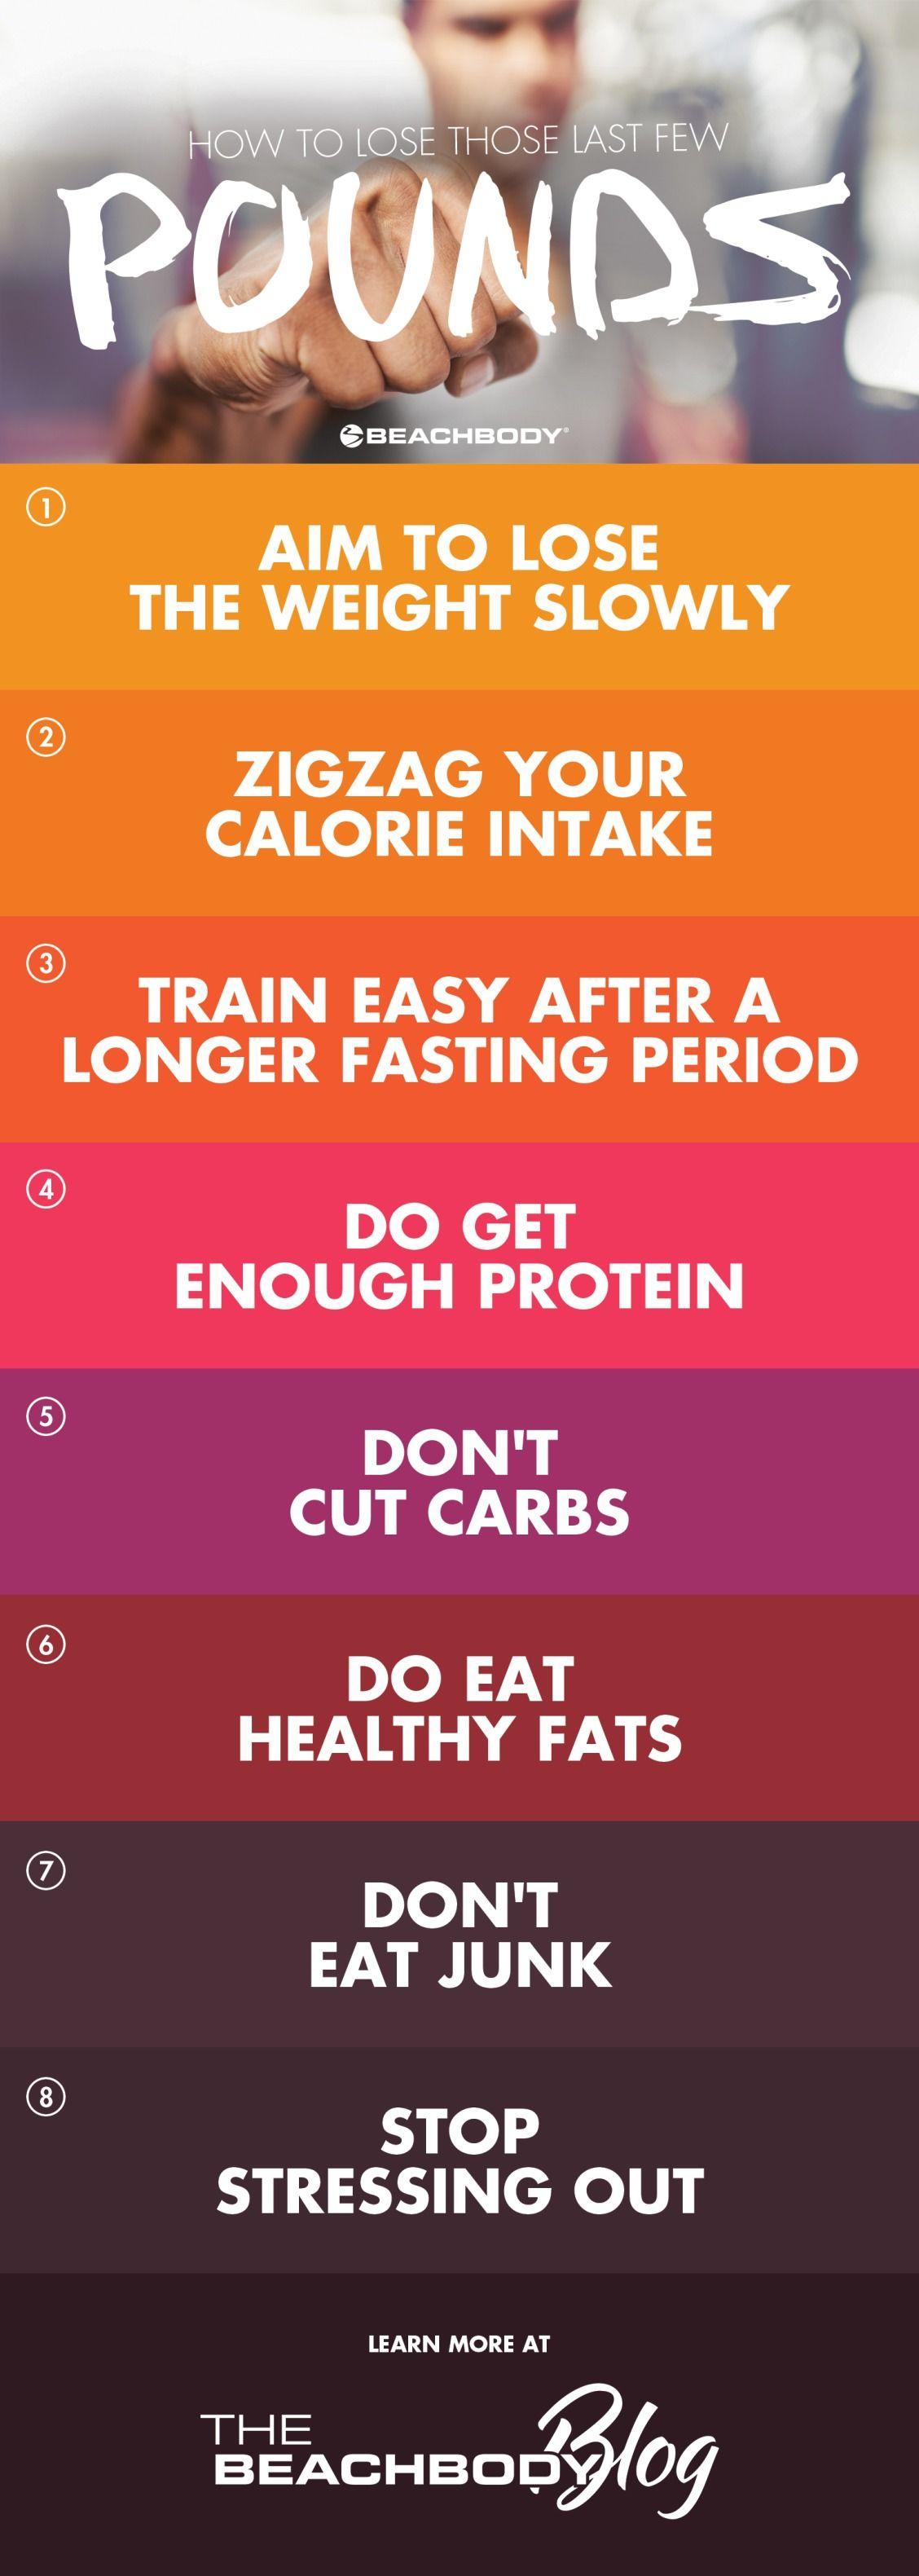 6 week weight loss challenge in henderson